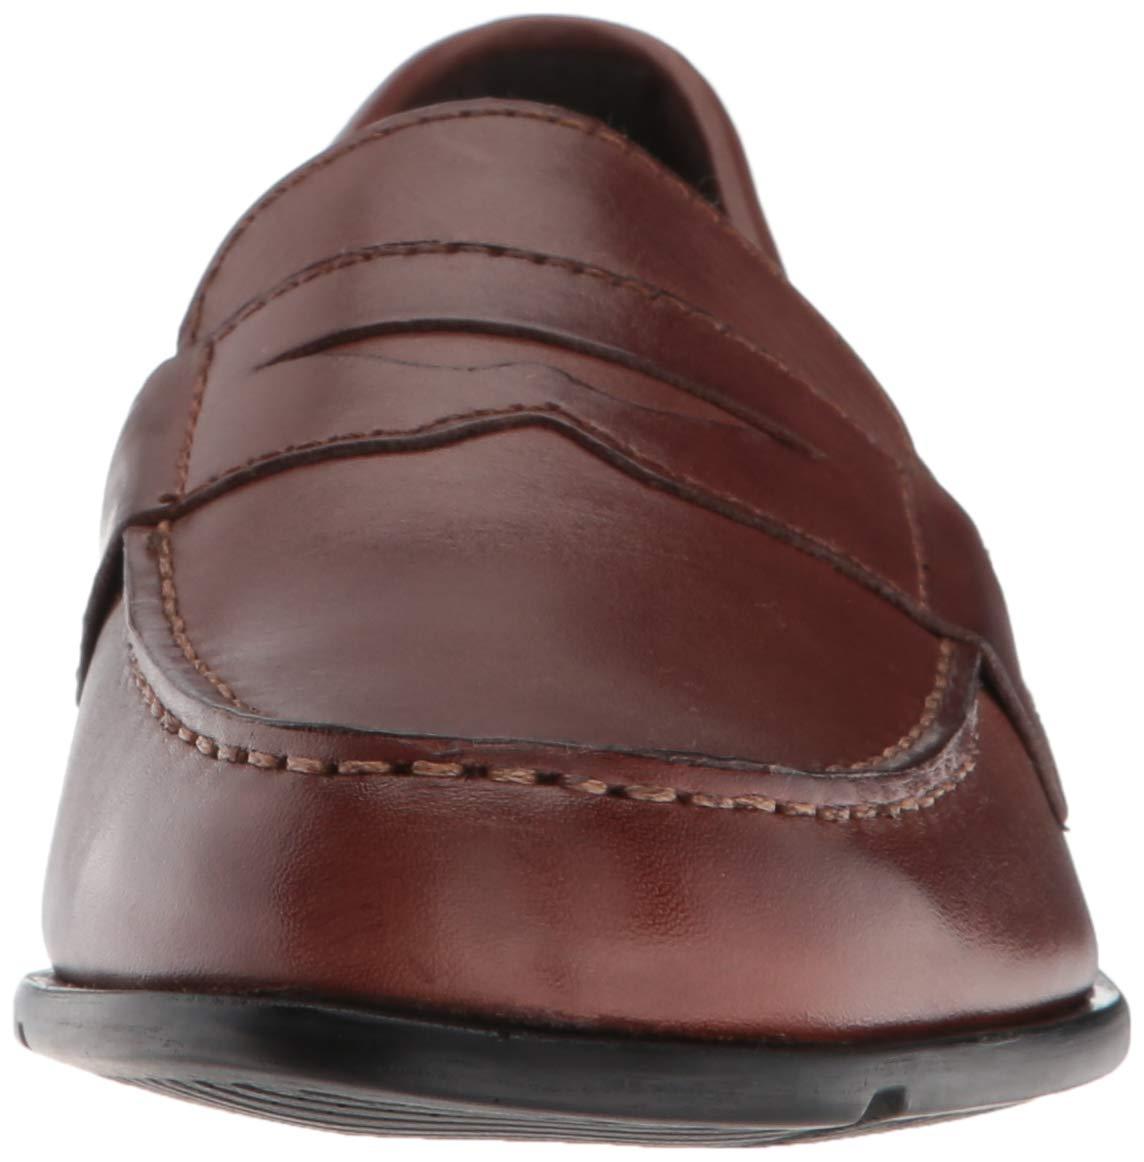 bf0da79507b Rockport Men s Classic Lite Penny Loafer - V76688   Loafers   Slip-Ons    Clothing